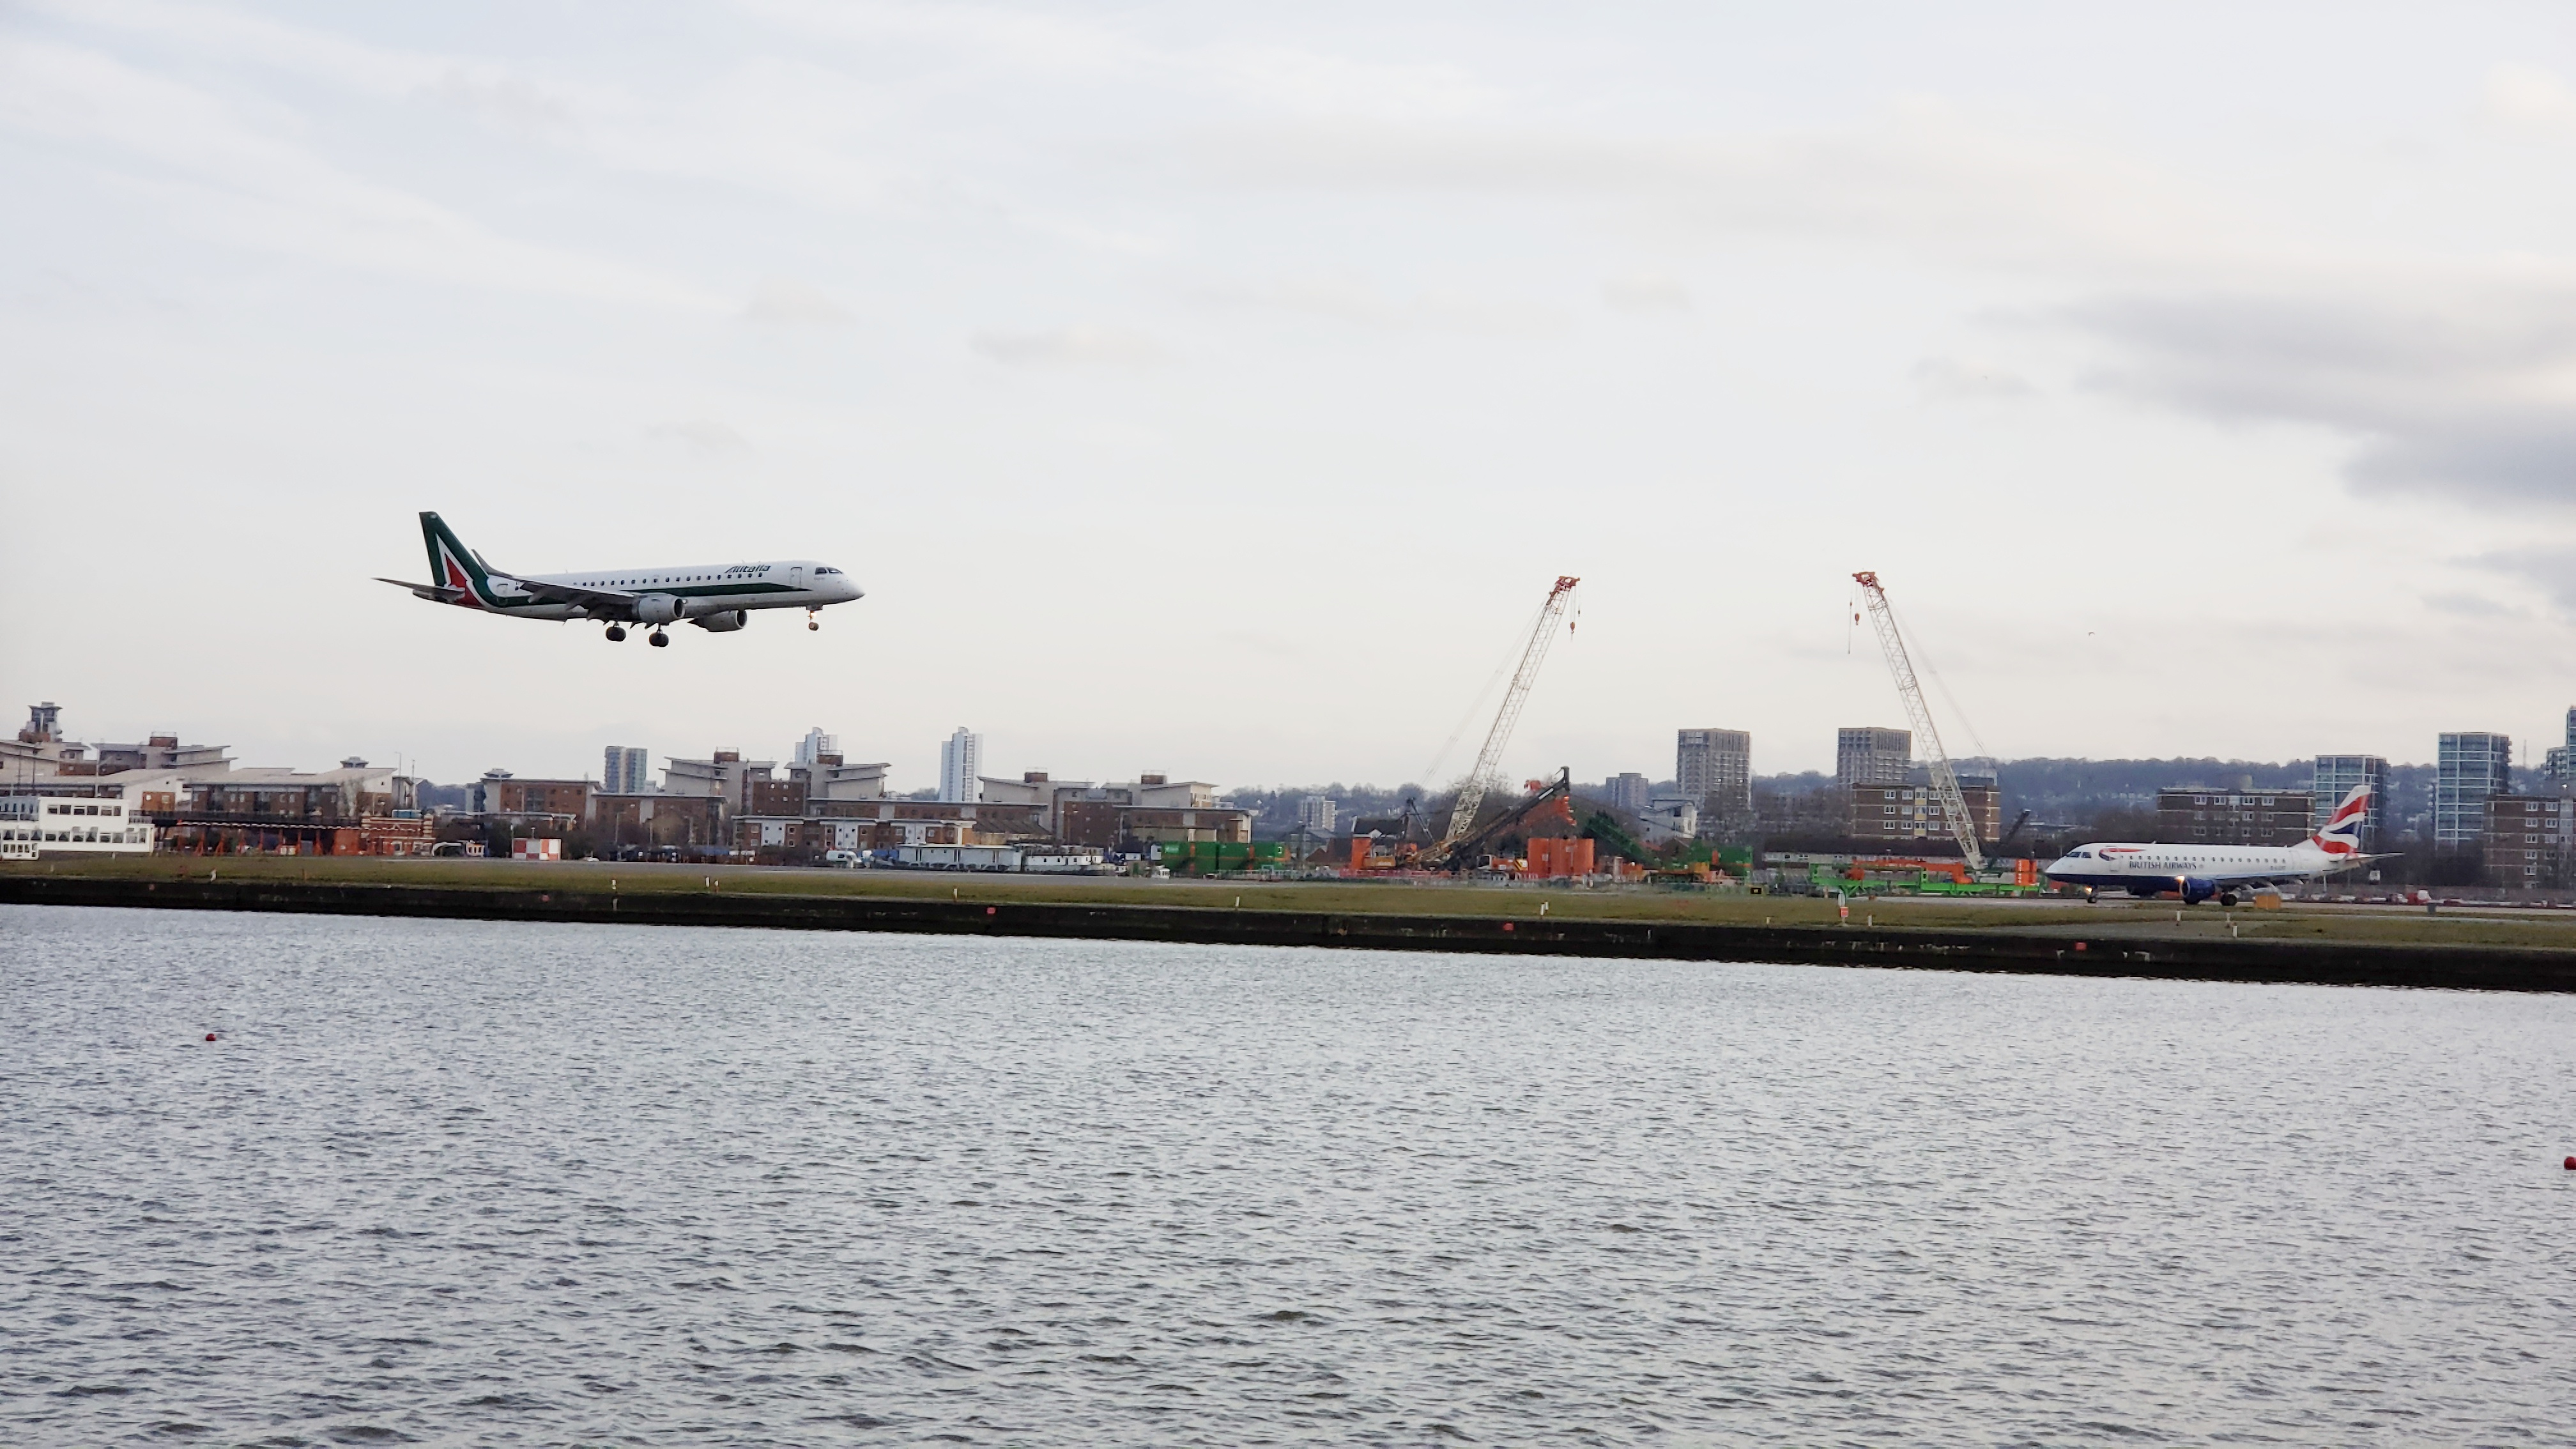 Plane Spotting - 20190217 Alitalia ERJ BA ERJ London-City (LCY)